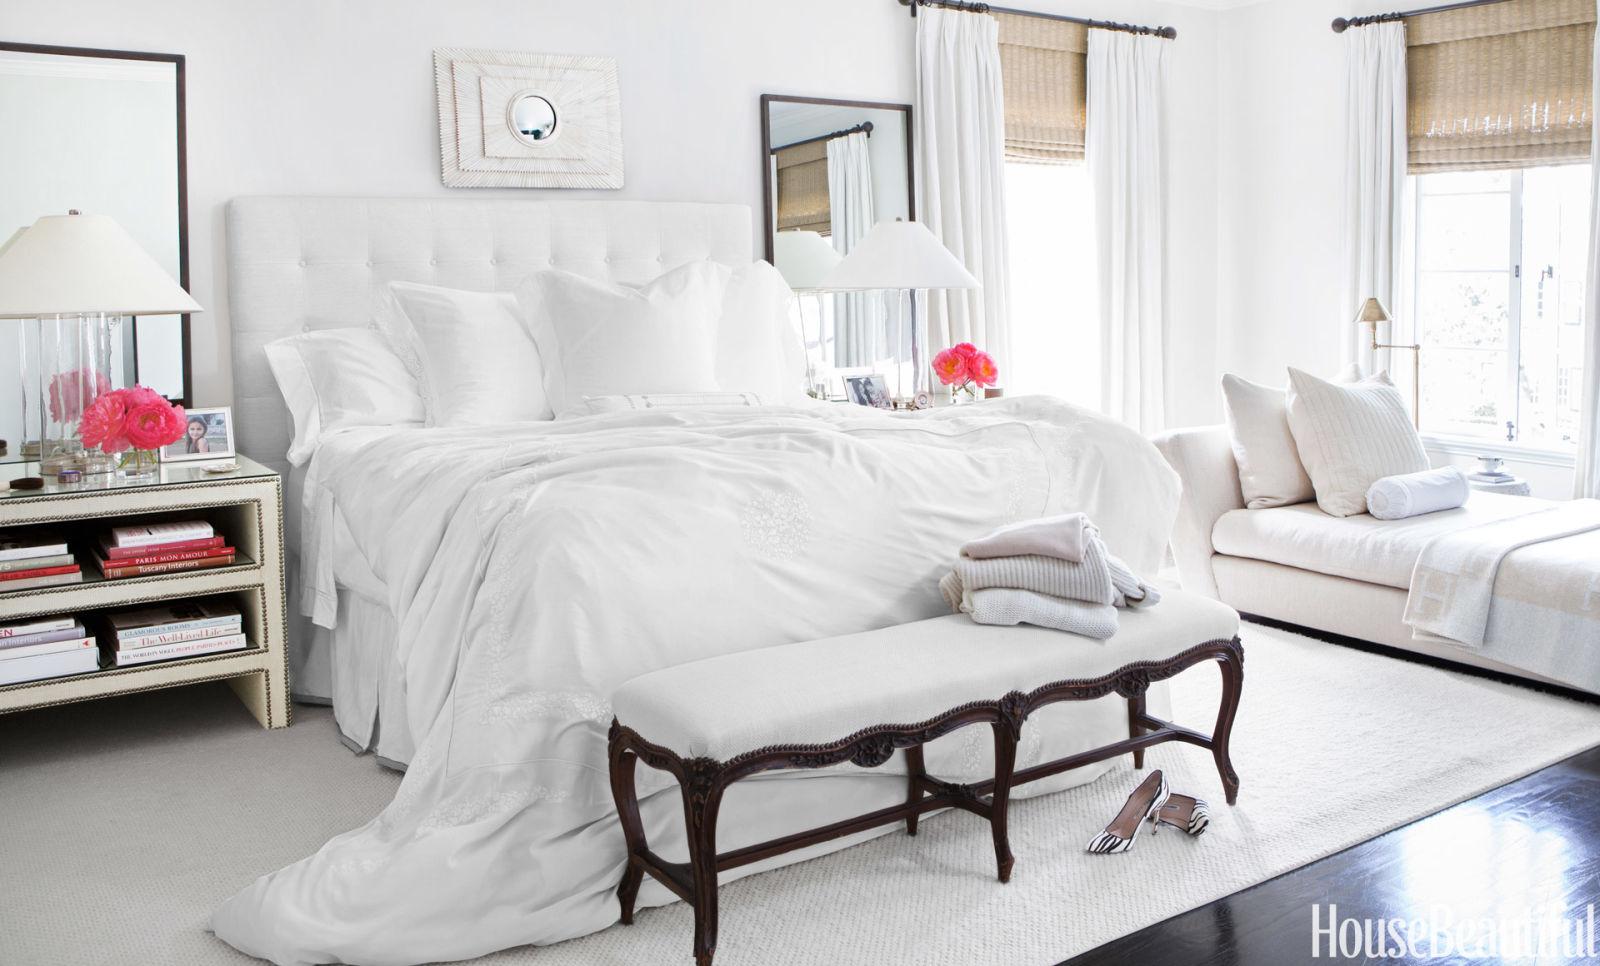 5 Ways to Improve Your Master Bedroom